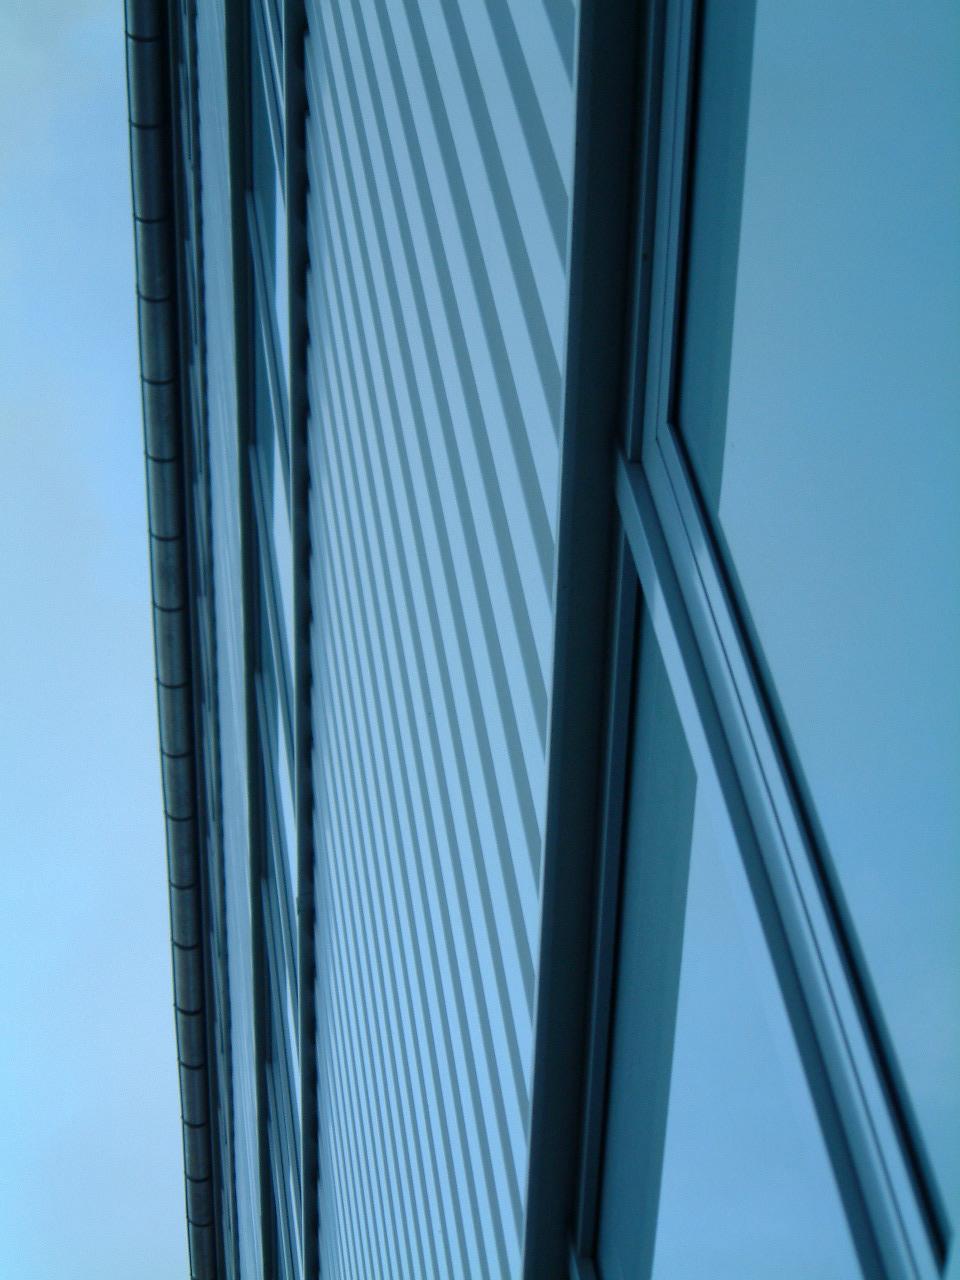 3-Fassadensanierung-Südzucker-Rain-Ansicht-Detail